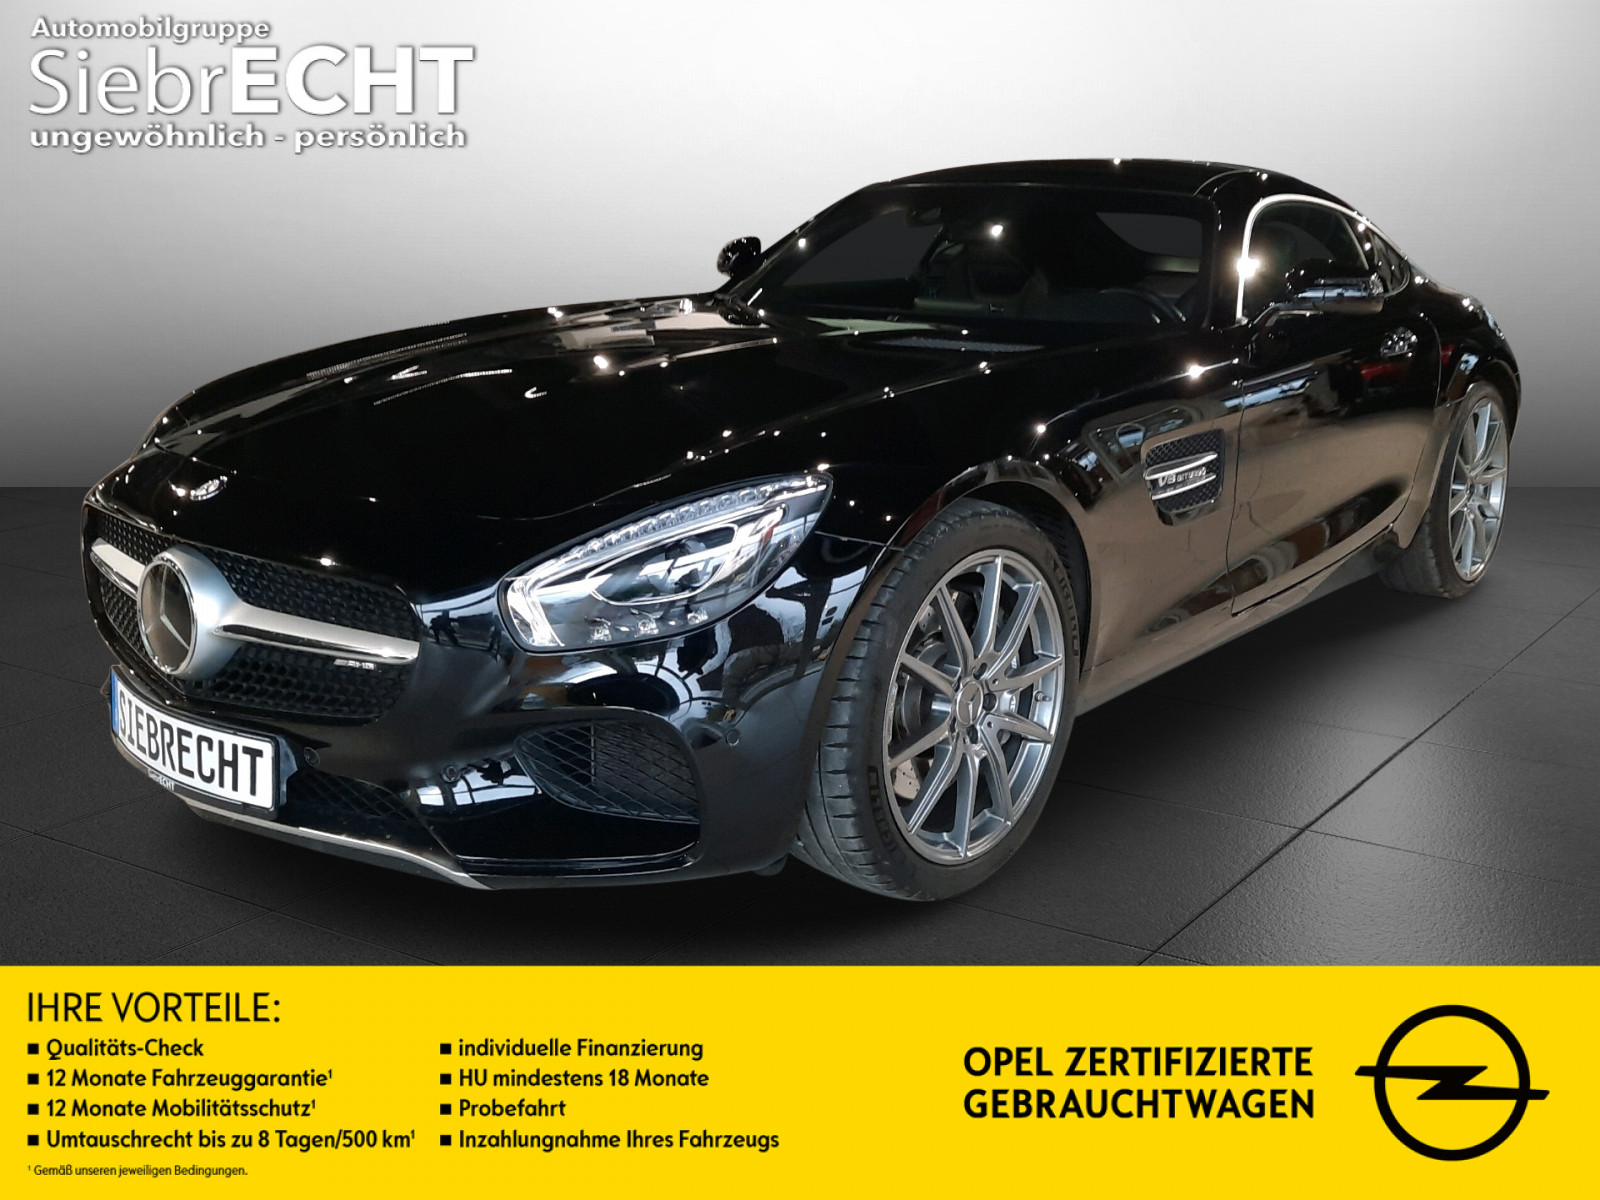 Mercedes-Benz AMG GT 4.0 V8 DCT*Leder*Panorama*Burmester*RFK*, Jahr 2016, Benzin